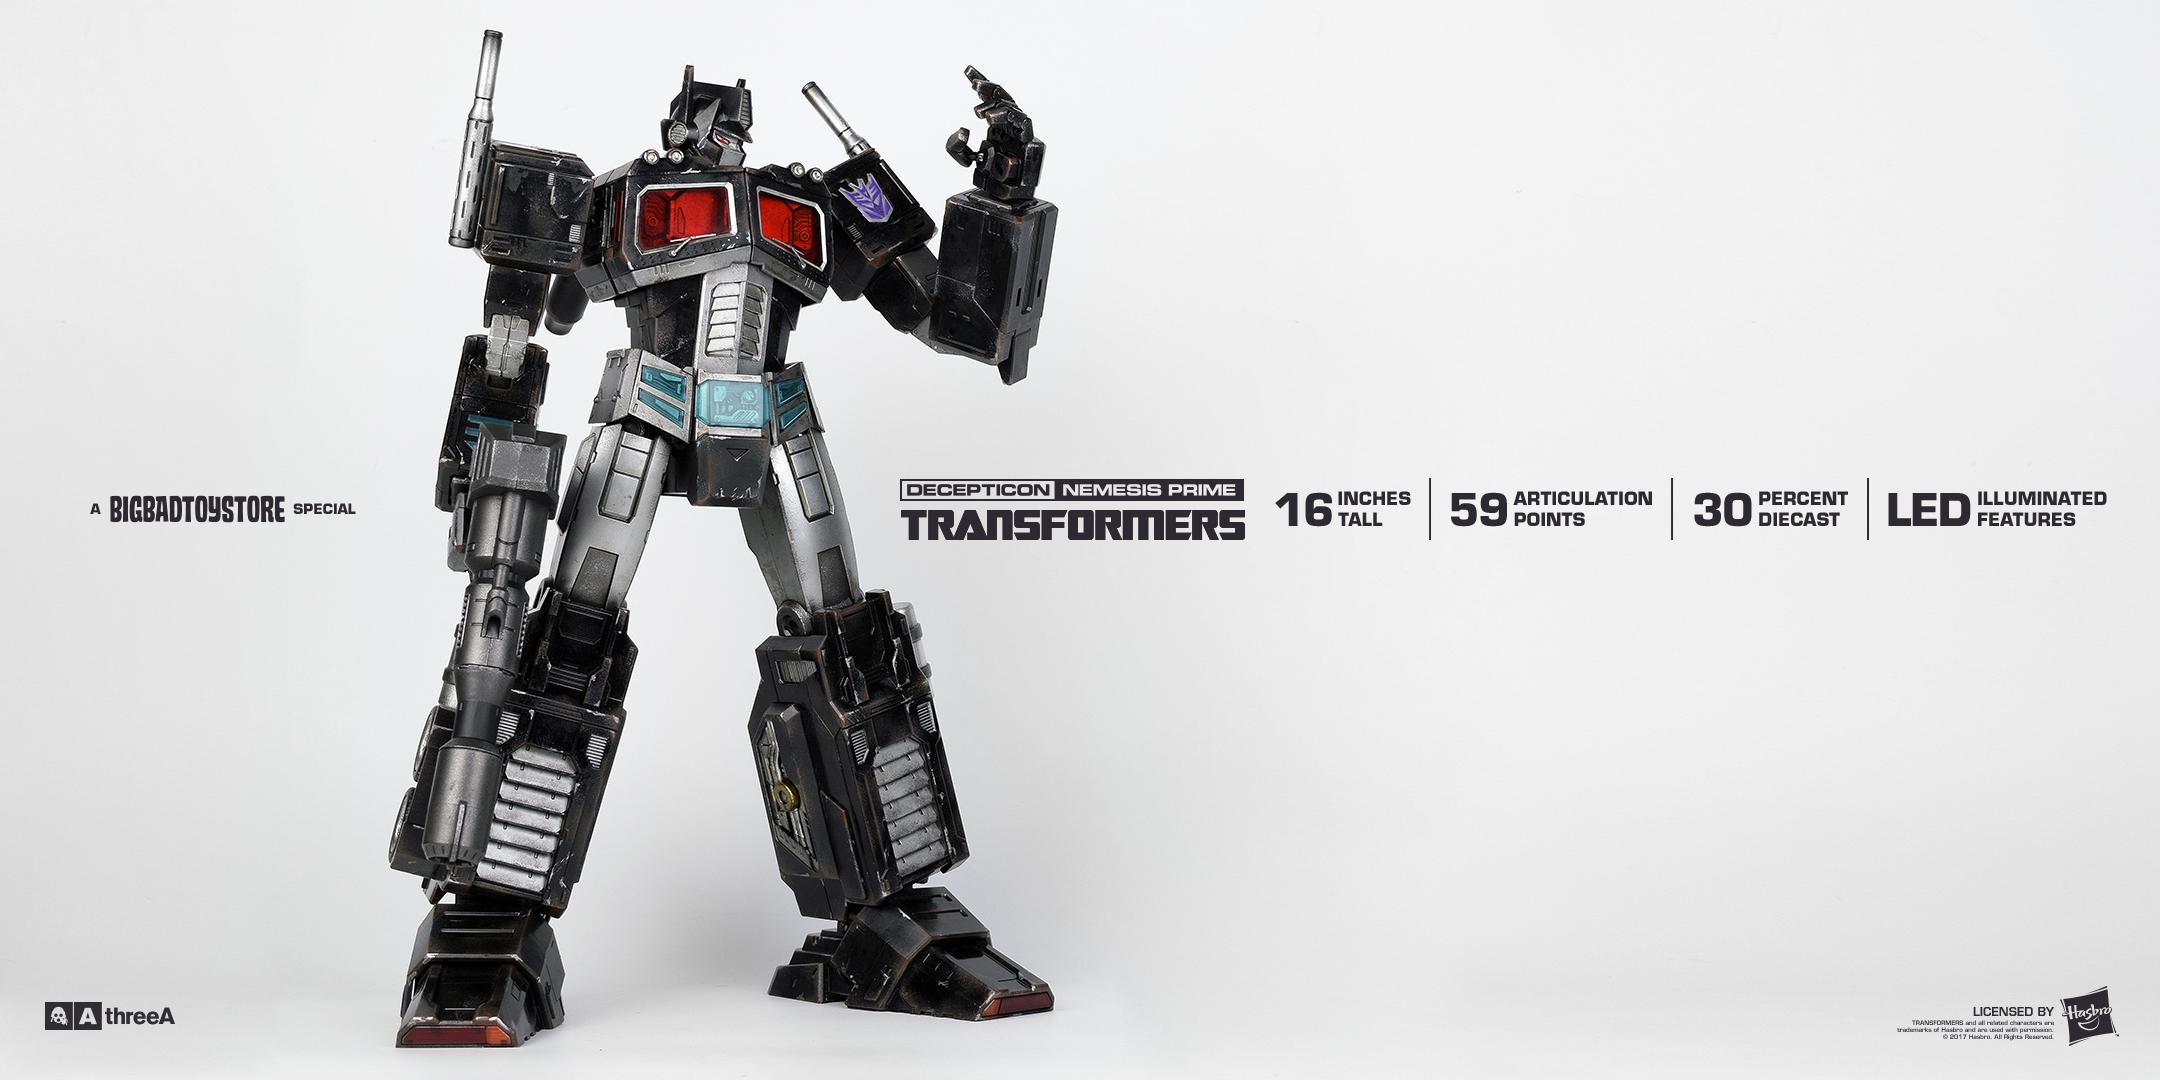 3A_Hasbro_Transformers_NemesisPrime_Landscape_v001.jpg